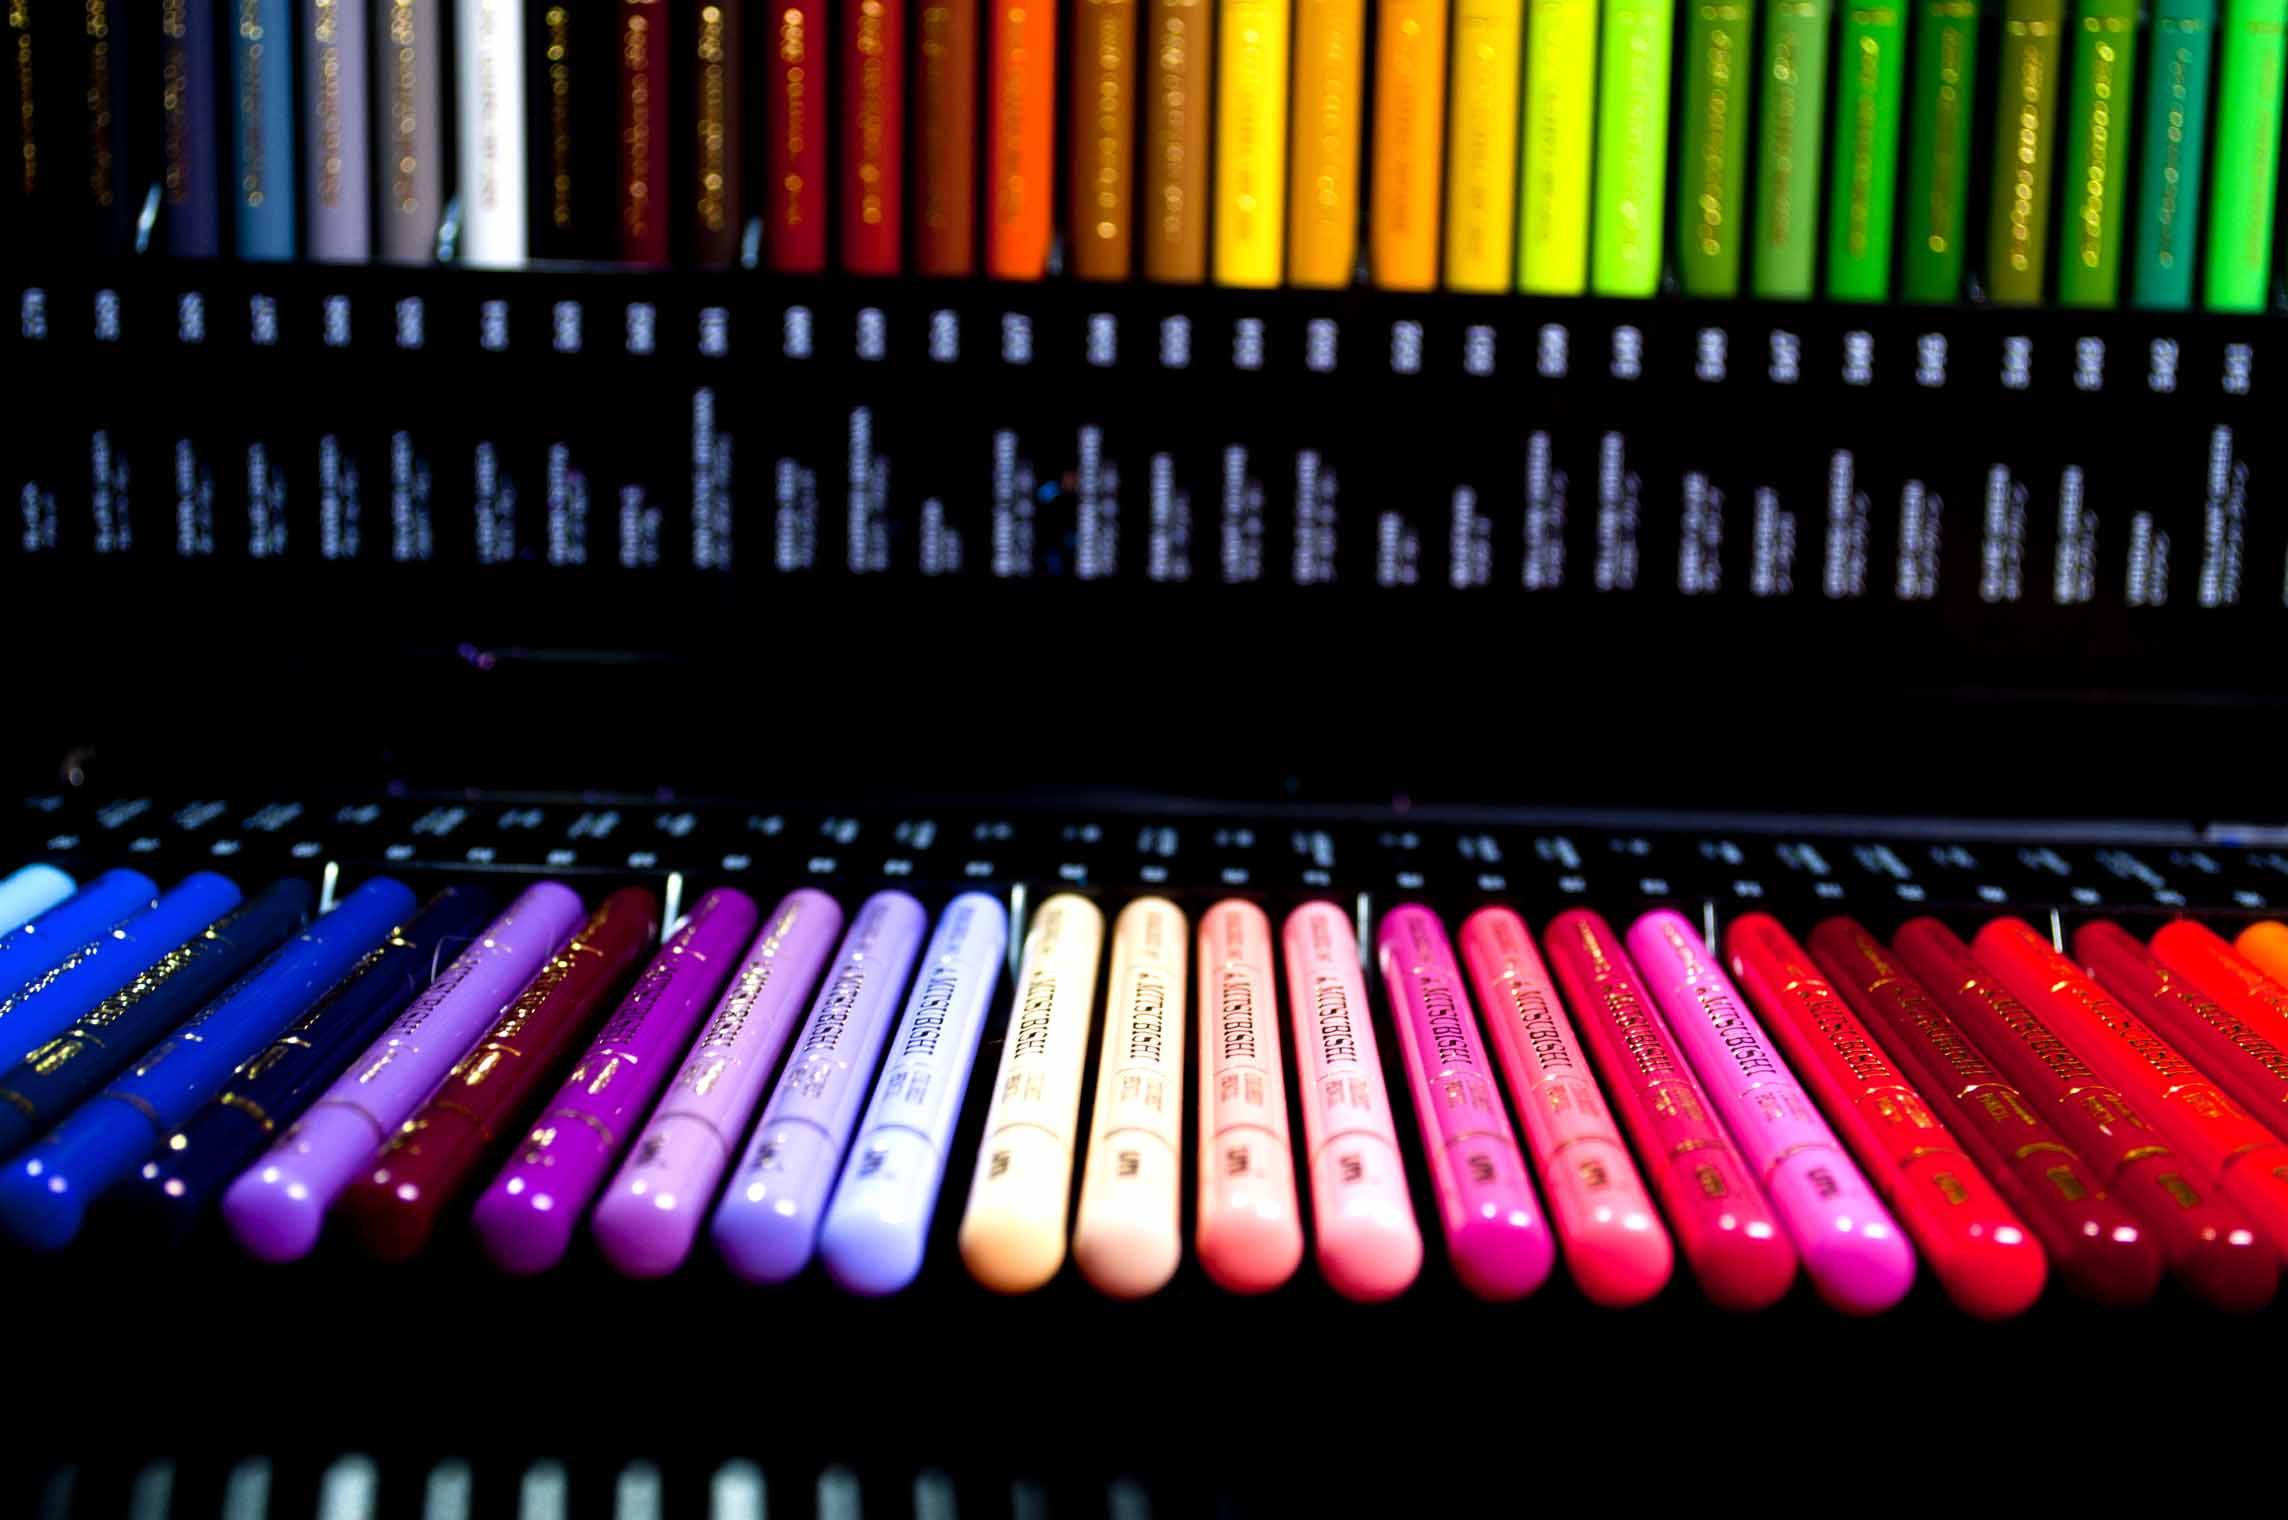 Mit Uni Side Pencils.jpg